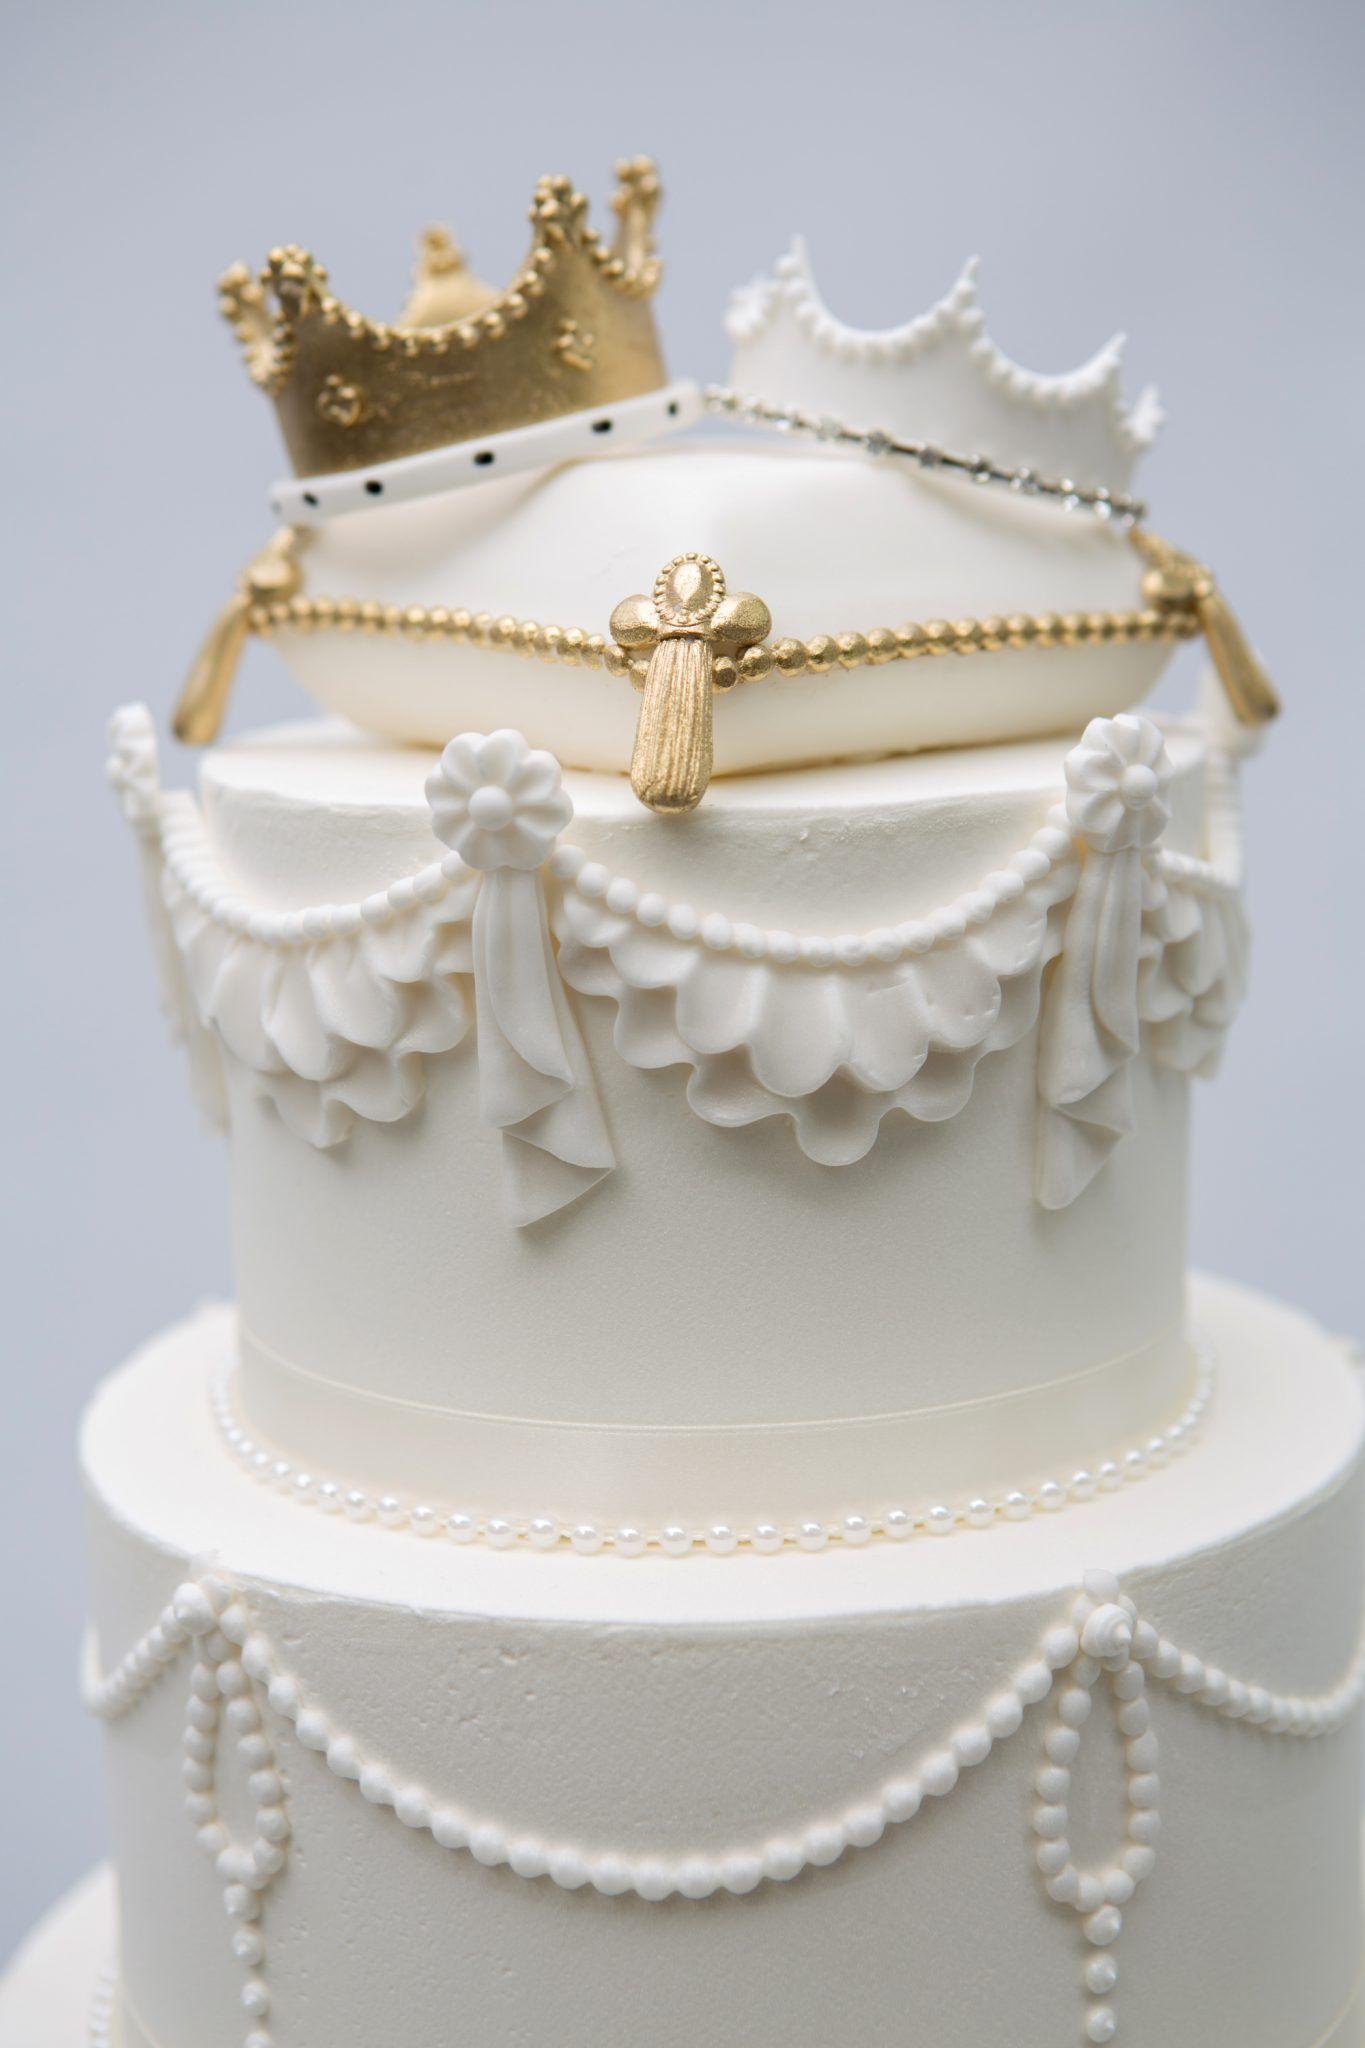 CHL Wedding Cake Trends 2018